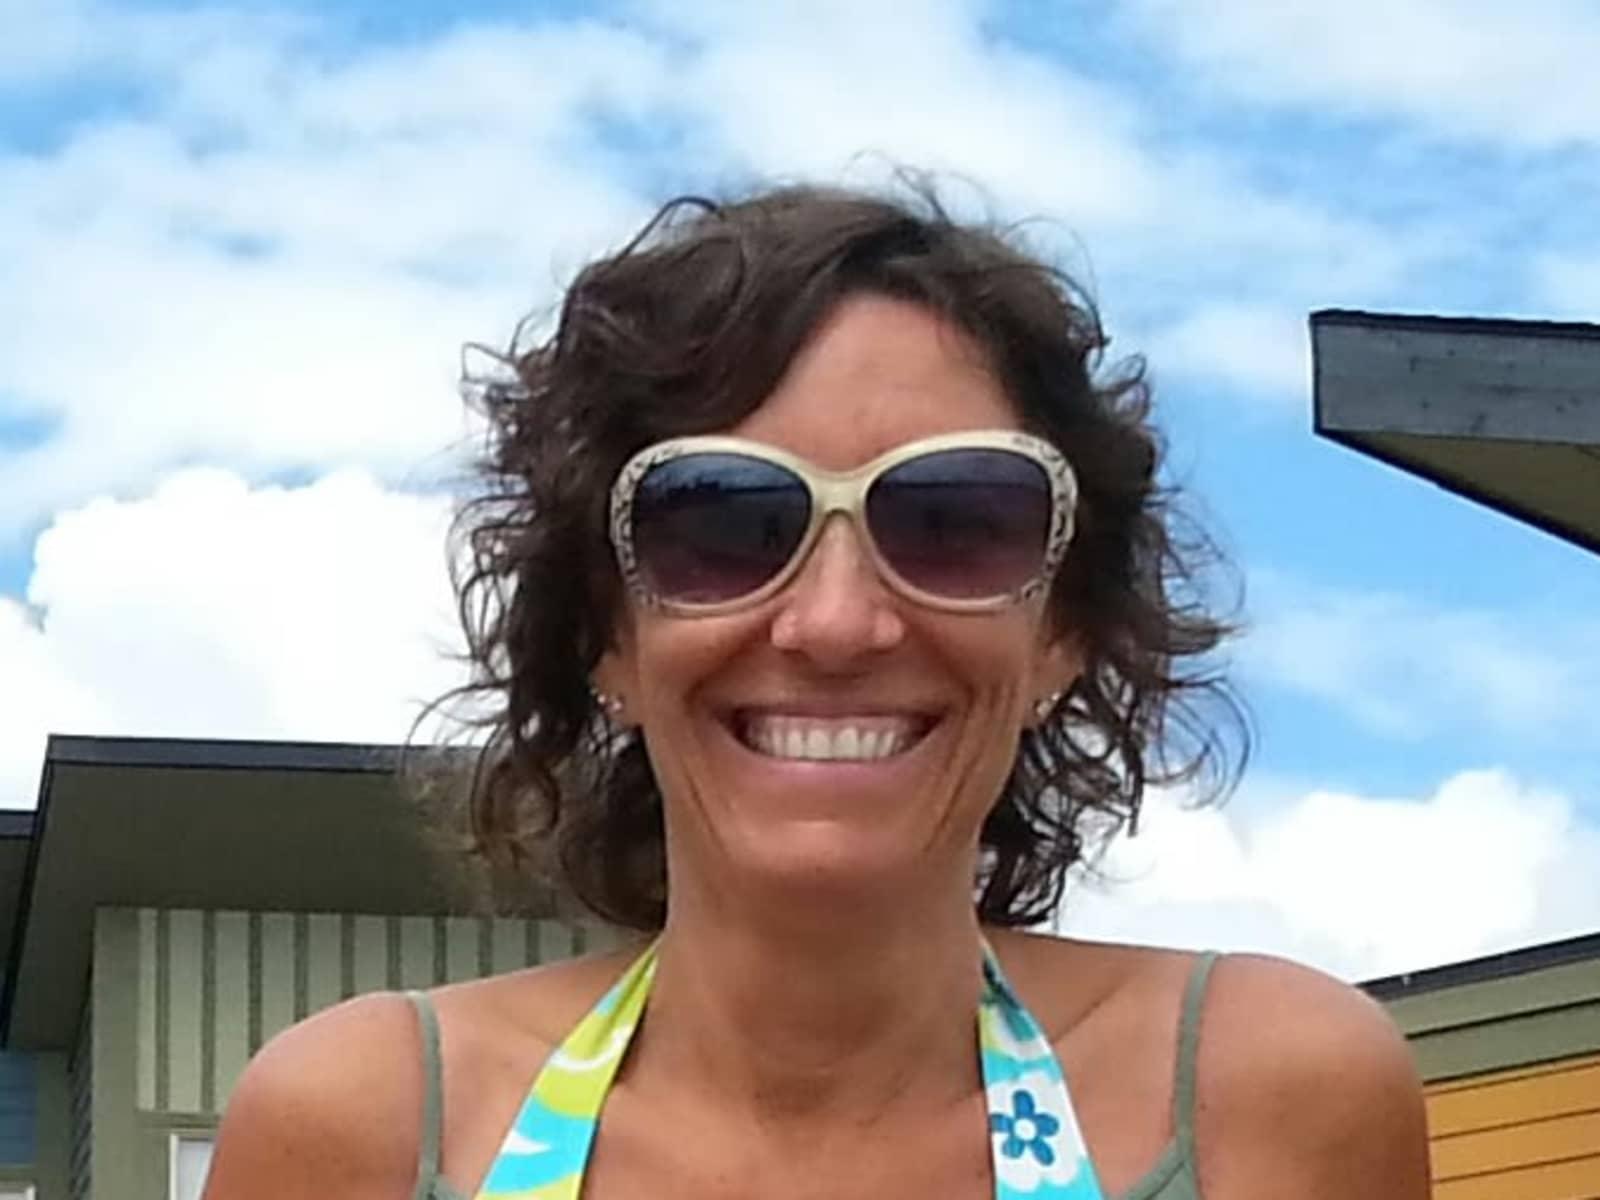 Lana from Calgary, Alberta, Canada